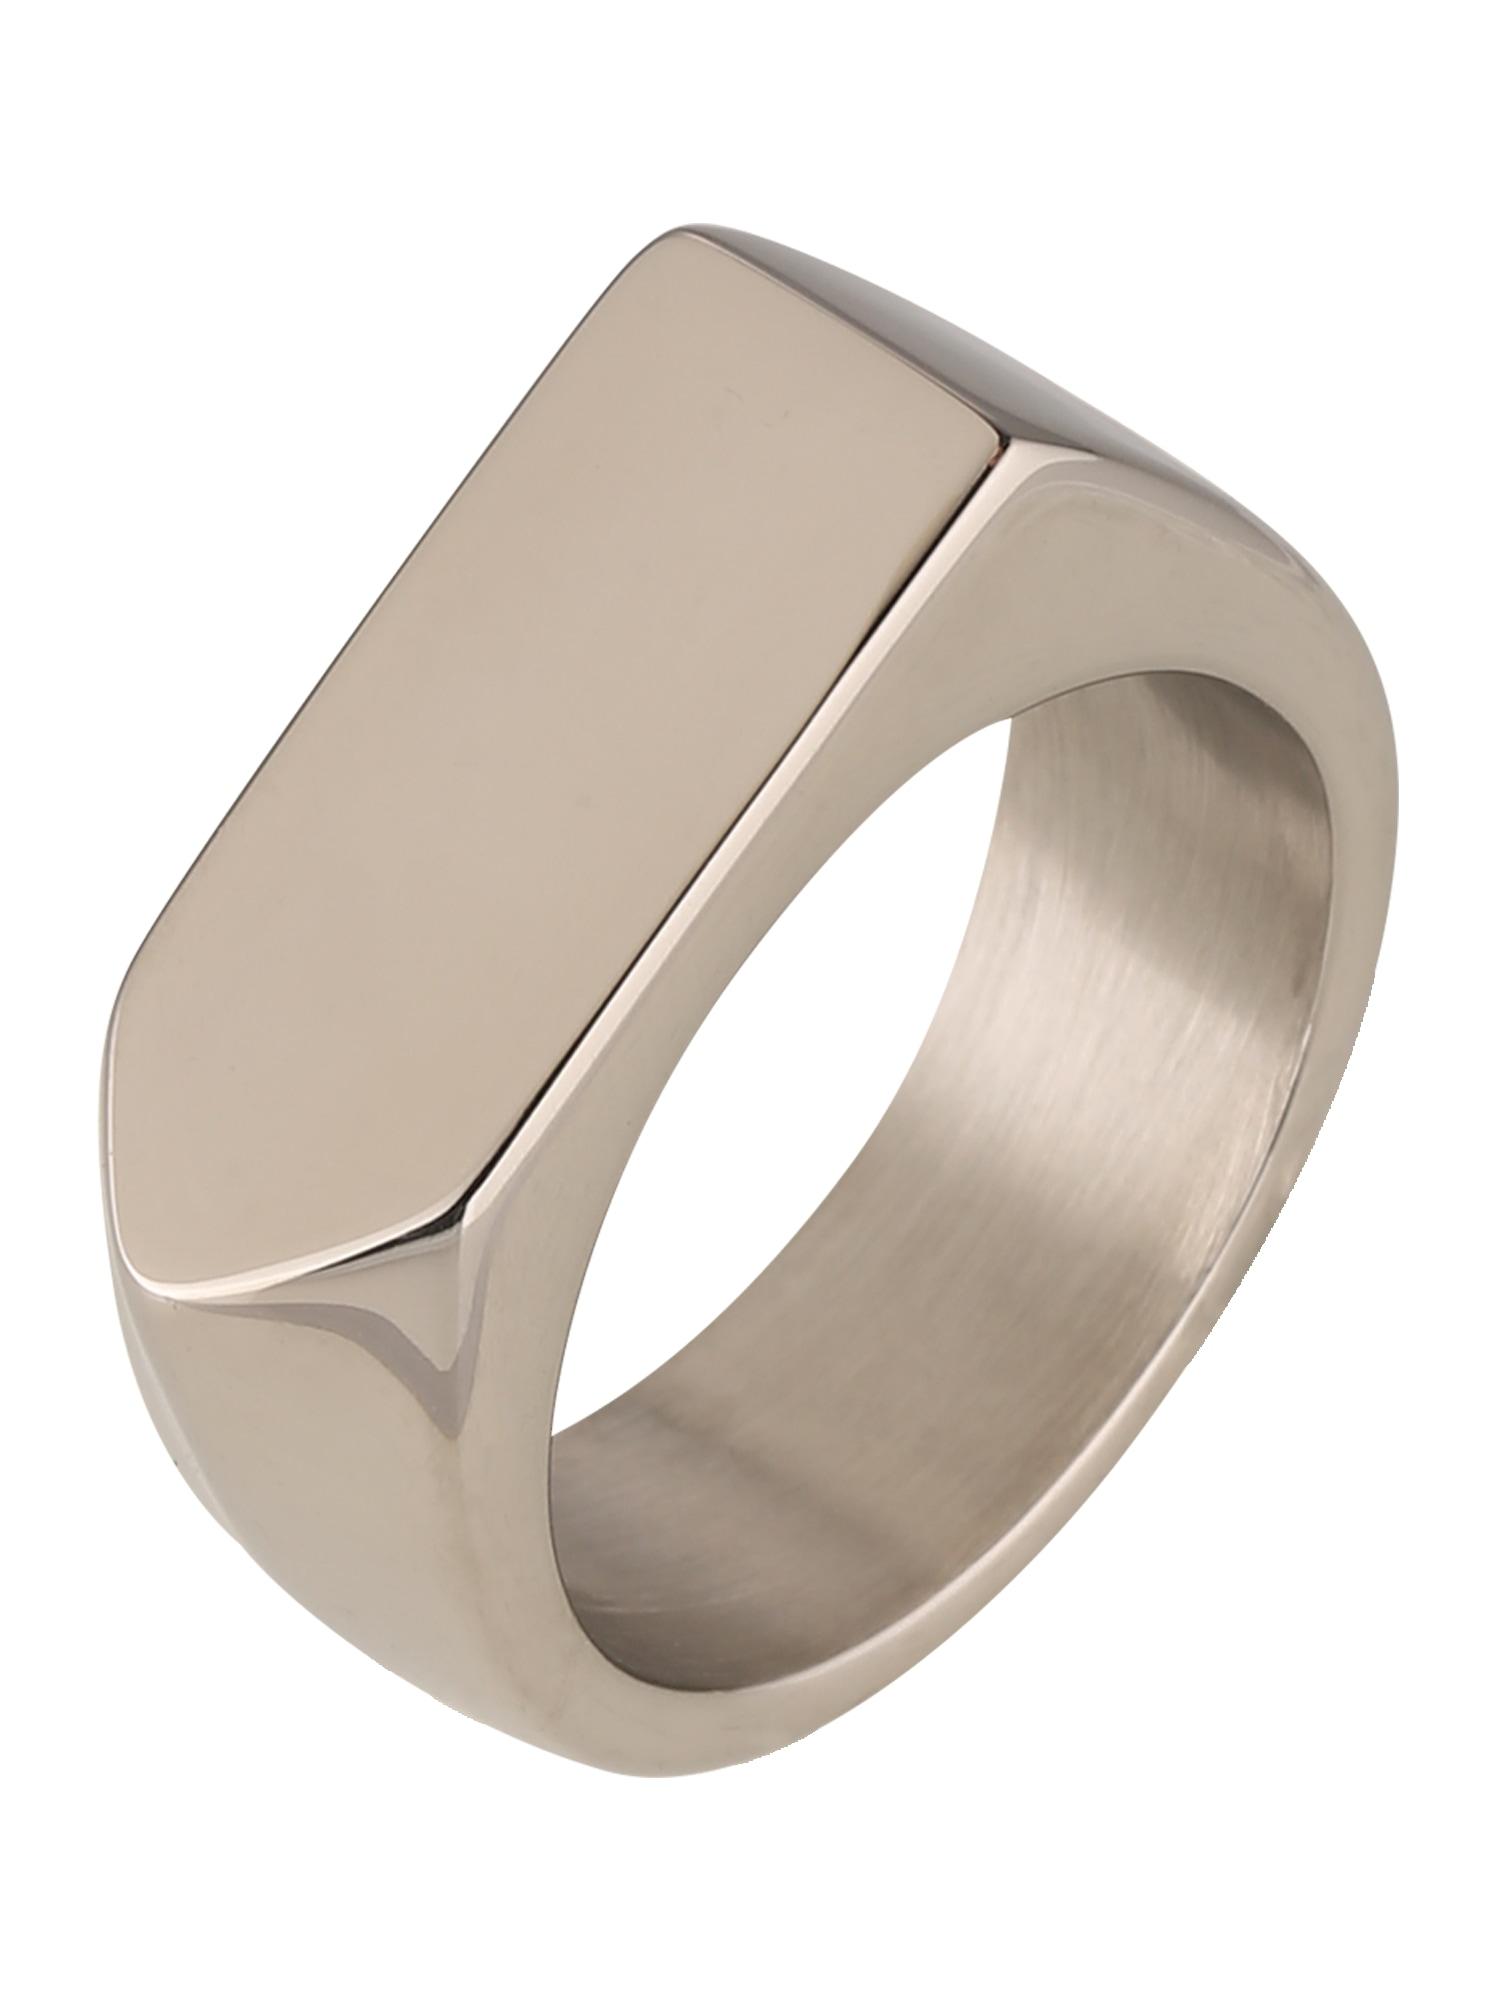 Prsten Ring Classic Line II stříbrná ROYAL-EGO